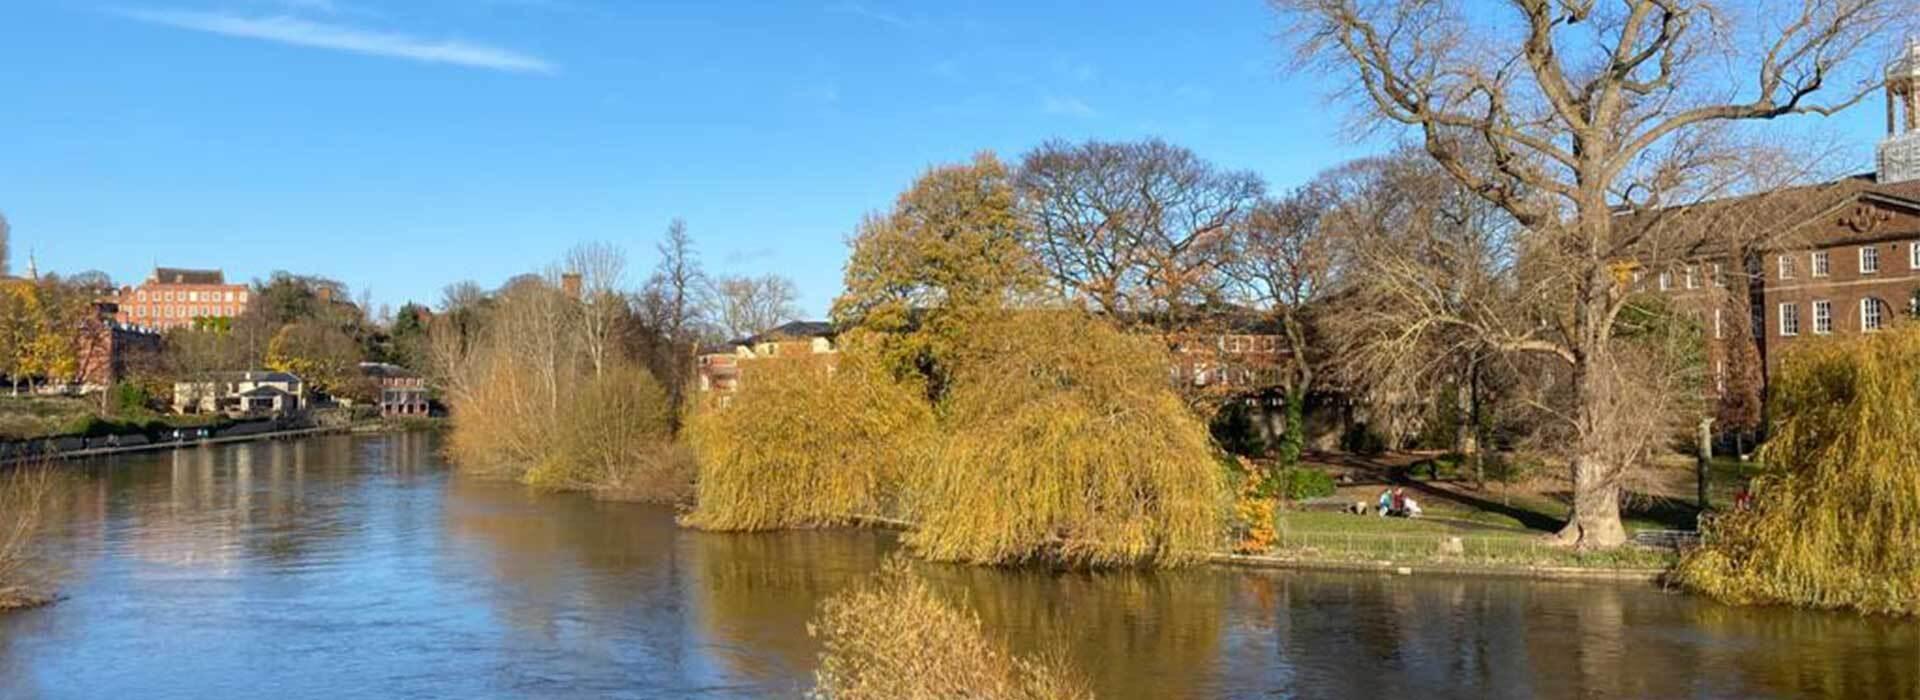 The Old Meadow Shrewsbury